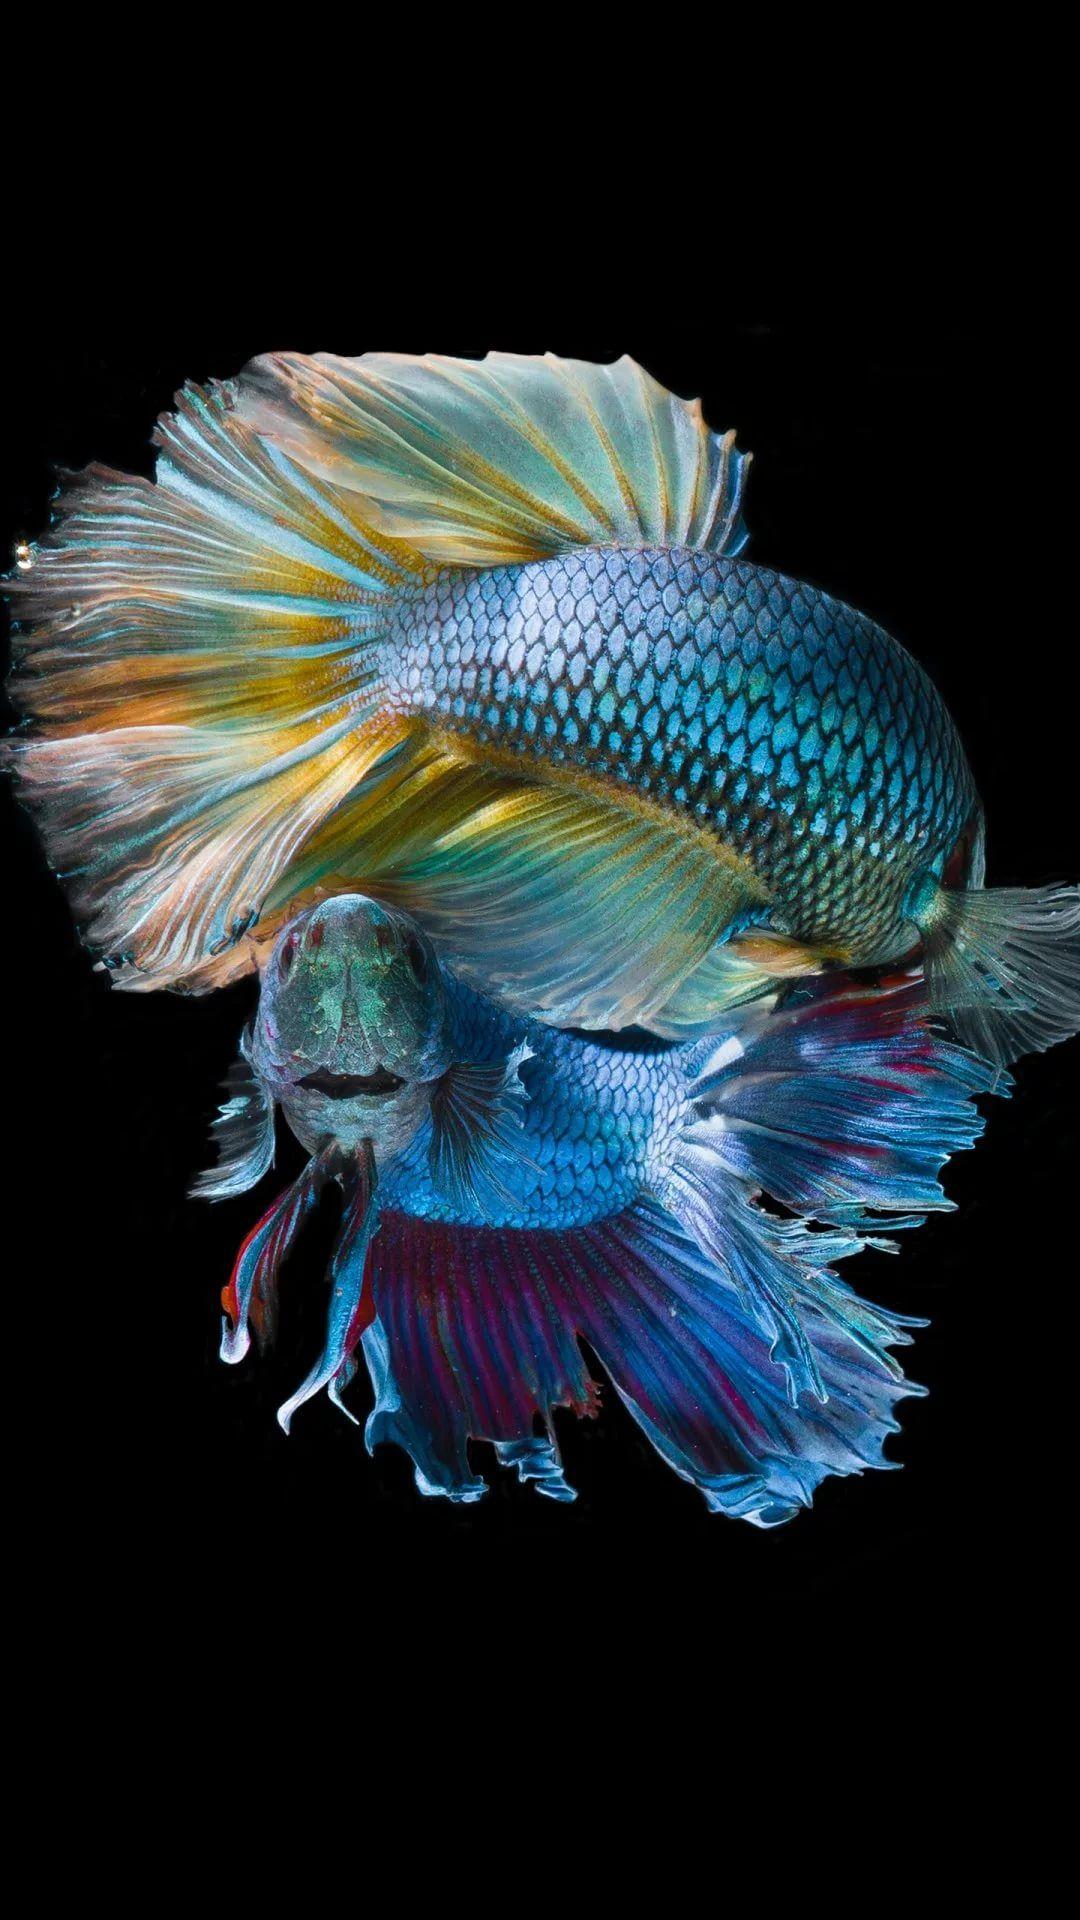 Fish wallpaper for my phone